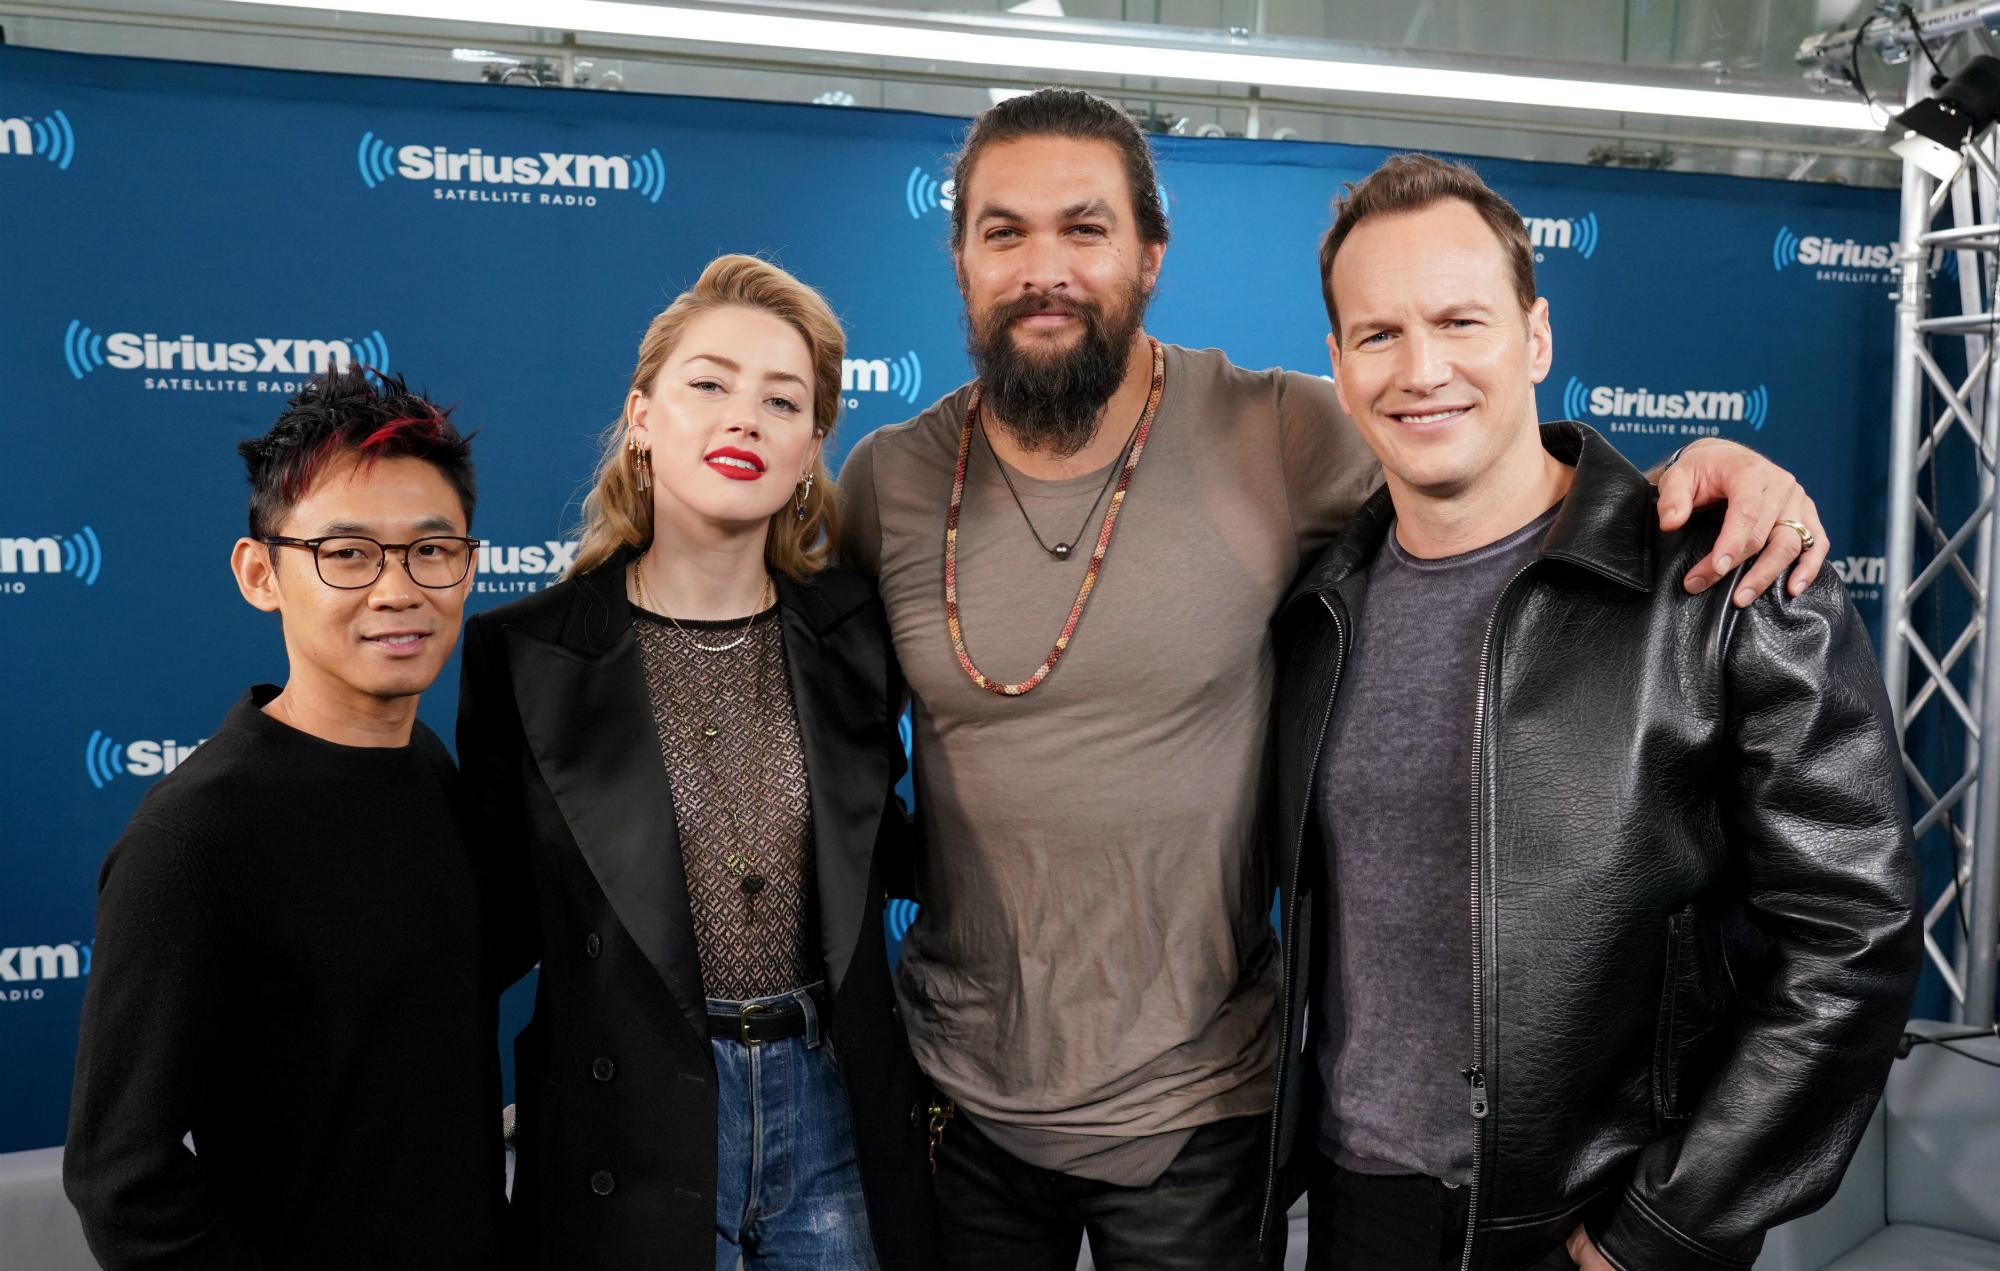 NME Festival blog: Warner Bros already in talks about 'Aquaman' sequel